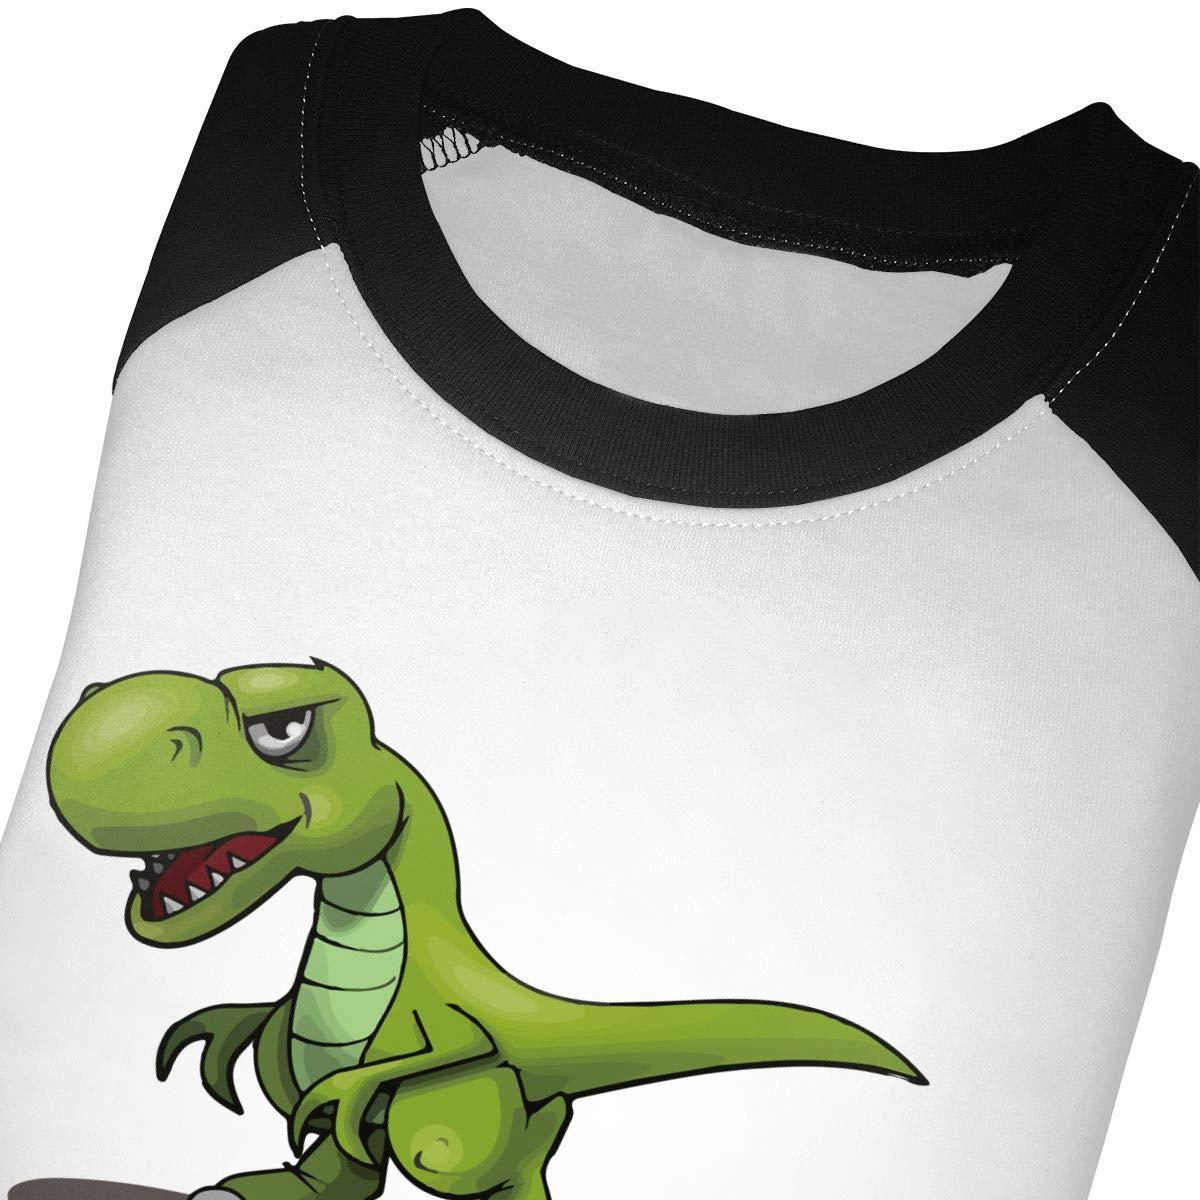 Manlee Cartoon Green Dinosaur Unisex 100/% Cotton Childrens 3//4 Sleeves T-Shirt Top Tees 2T~5//6T